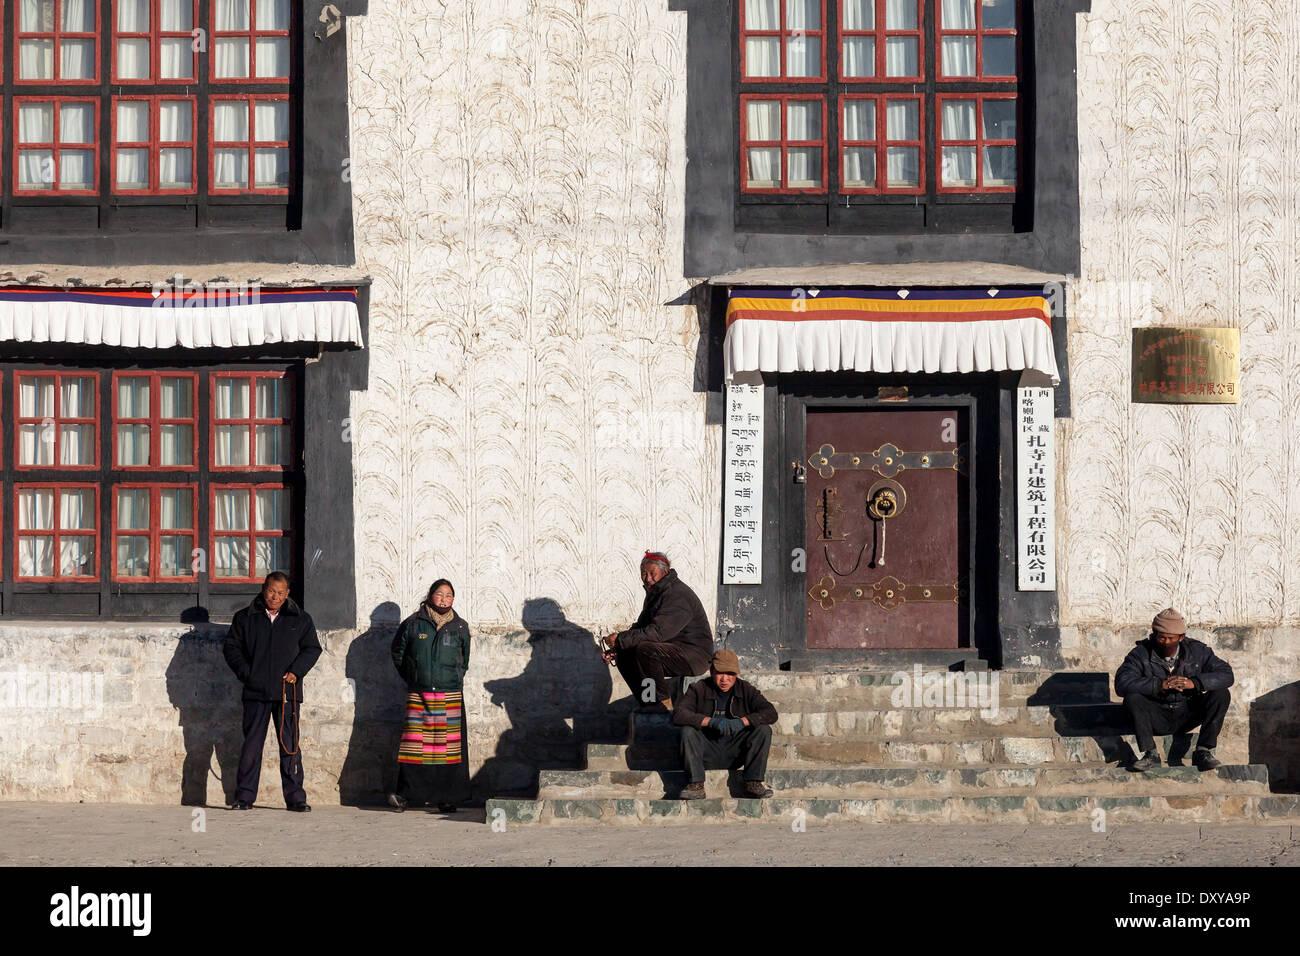 People waiting to pray in Tibet - Stock Image